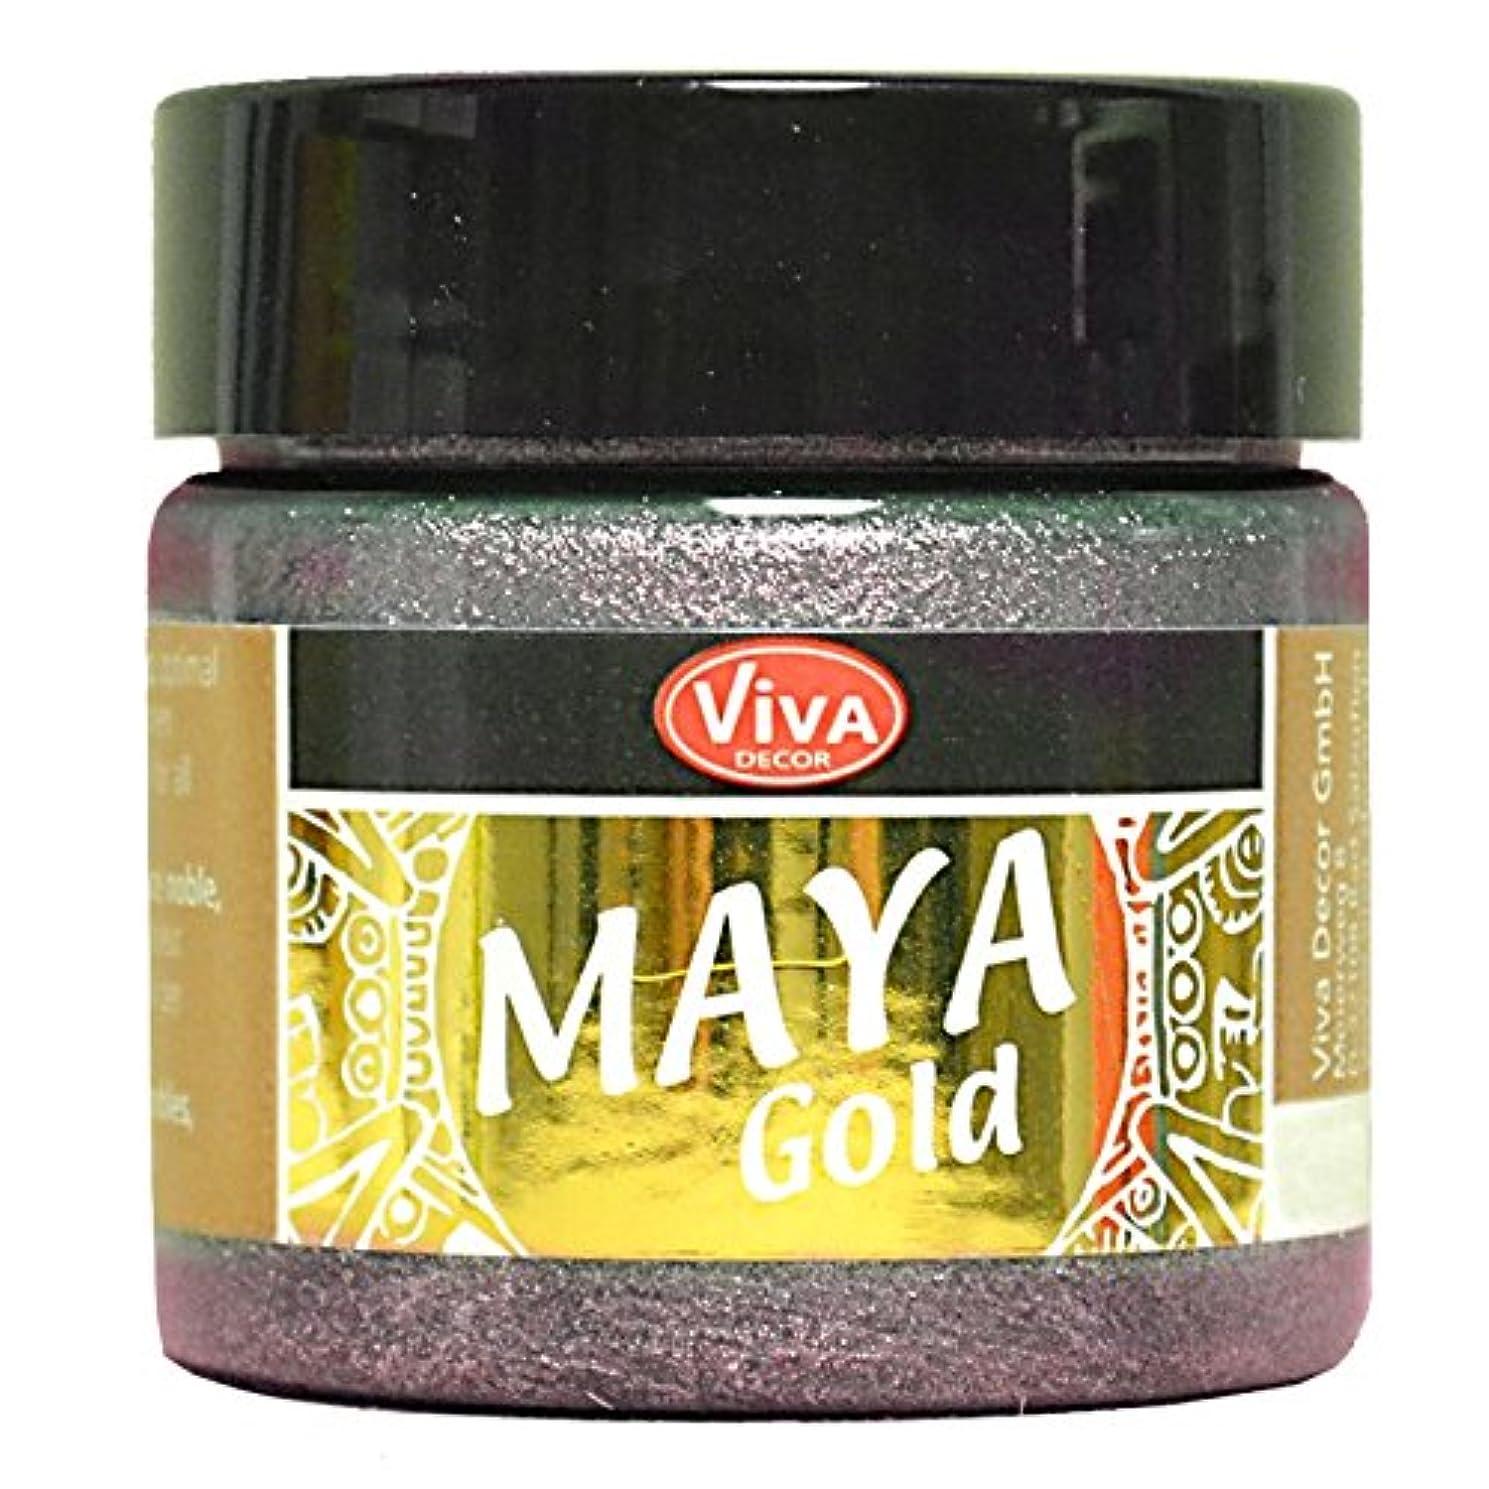 Viva Decor Maya Gold Paint, Acrylic, Purple/Mauve, Medium